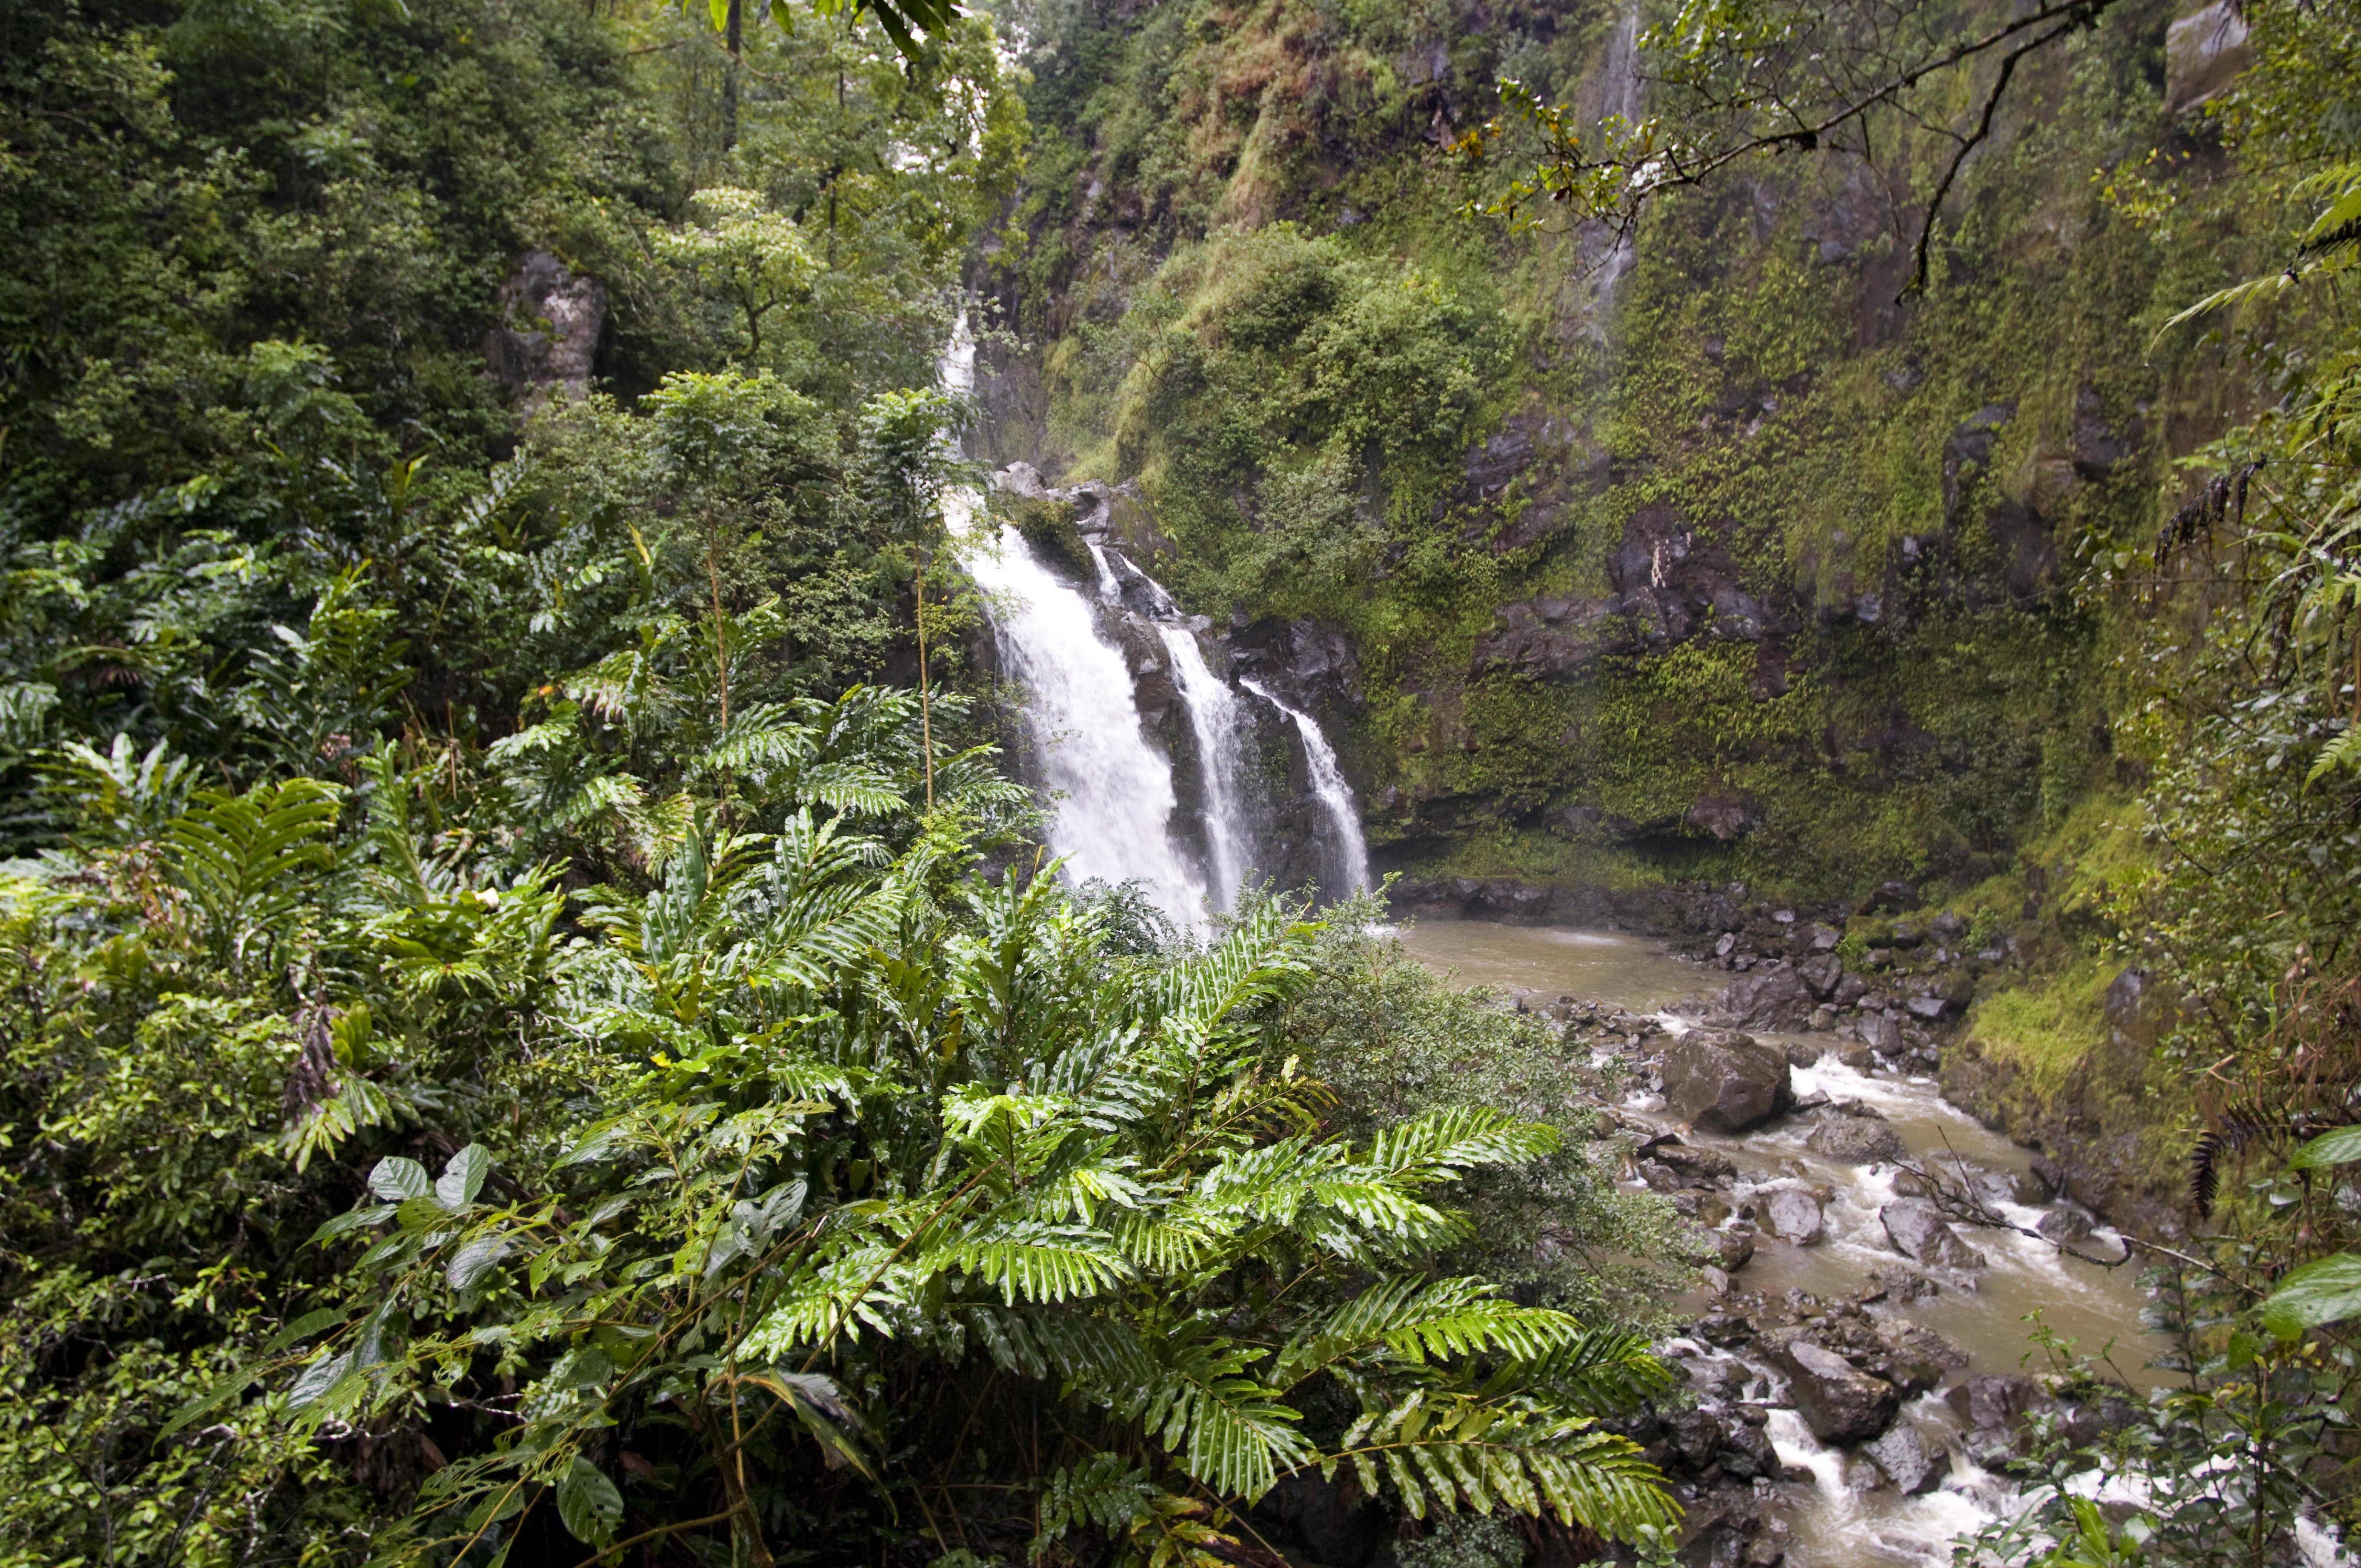 Widow dies rock climbing in Hawaii during 'healing vacation